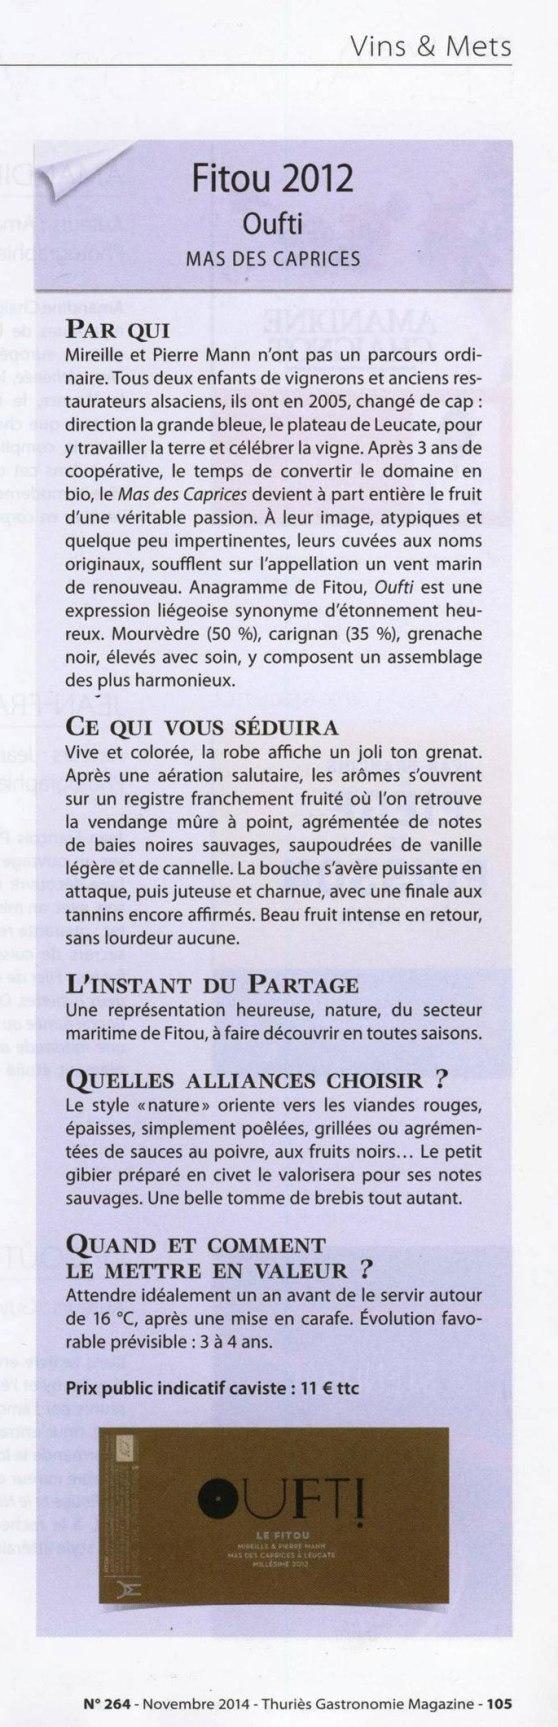 Oufti sur Thuries magazine